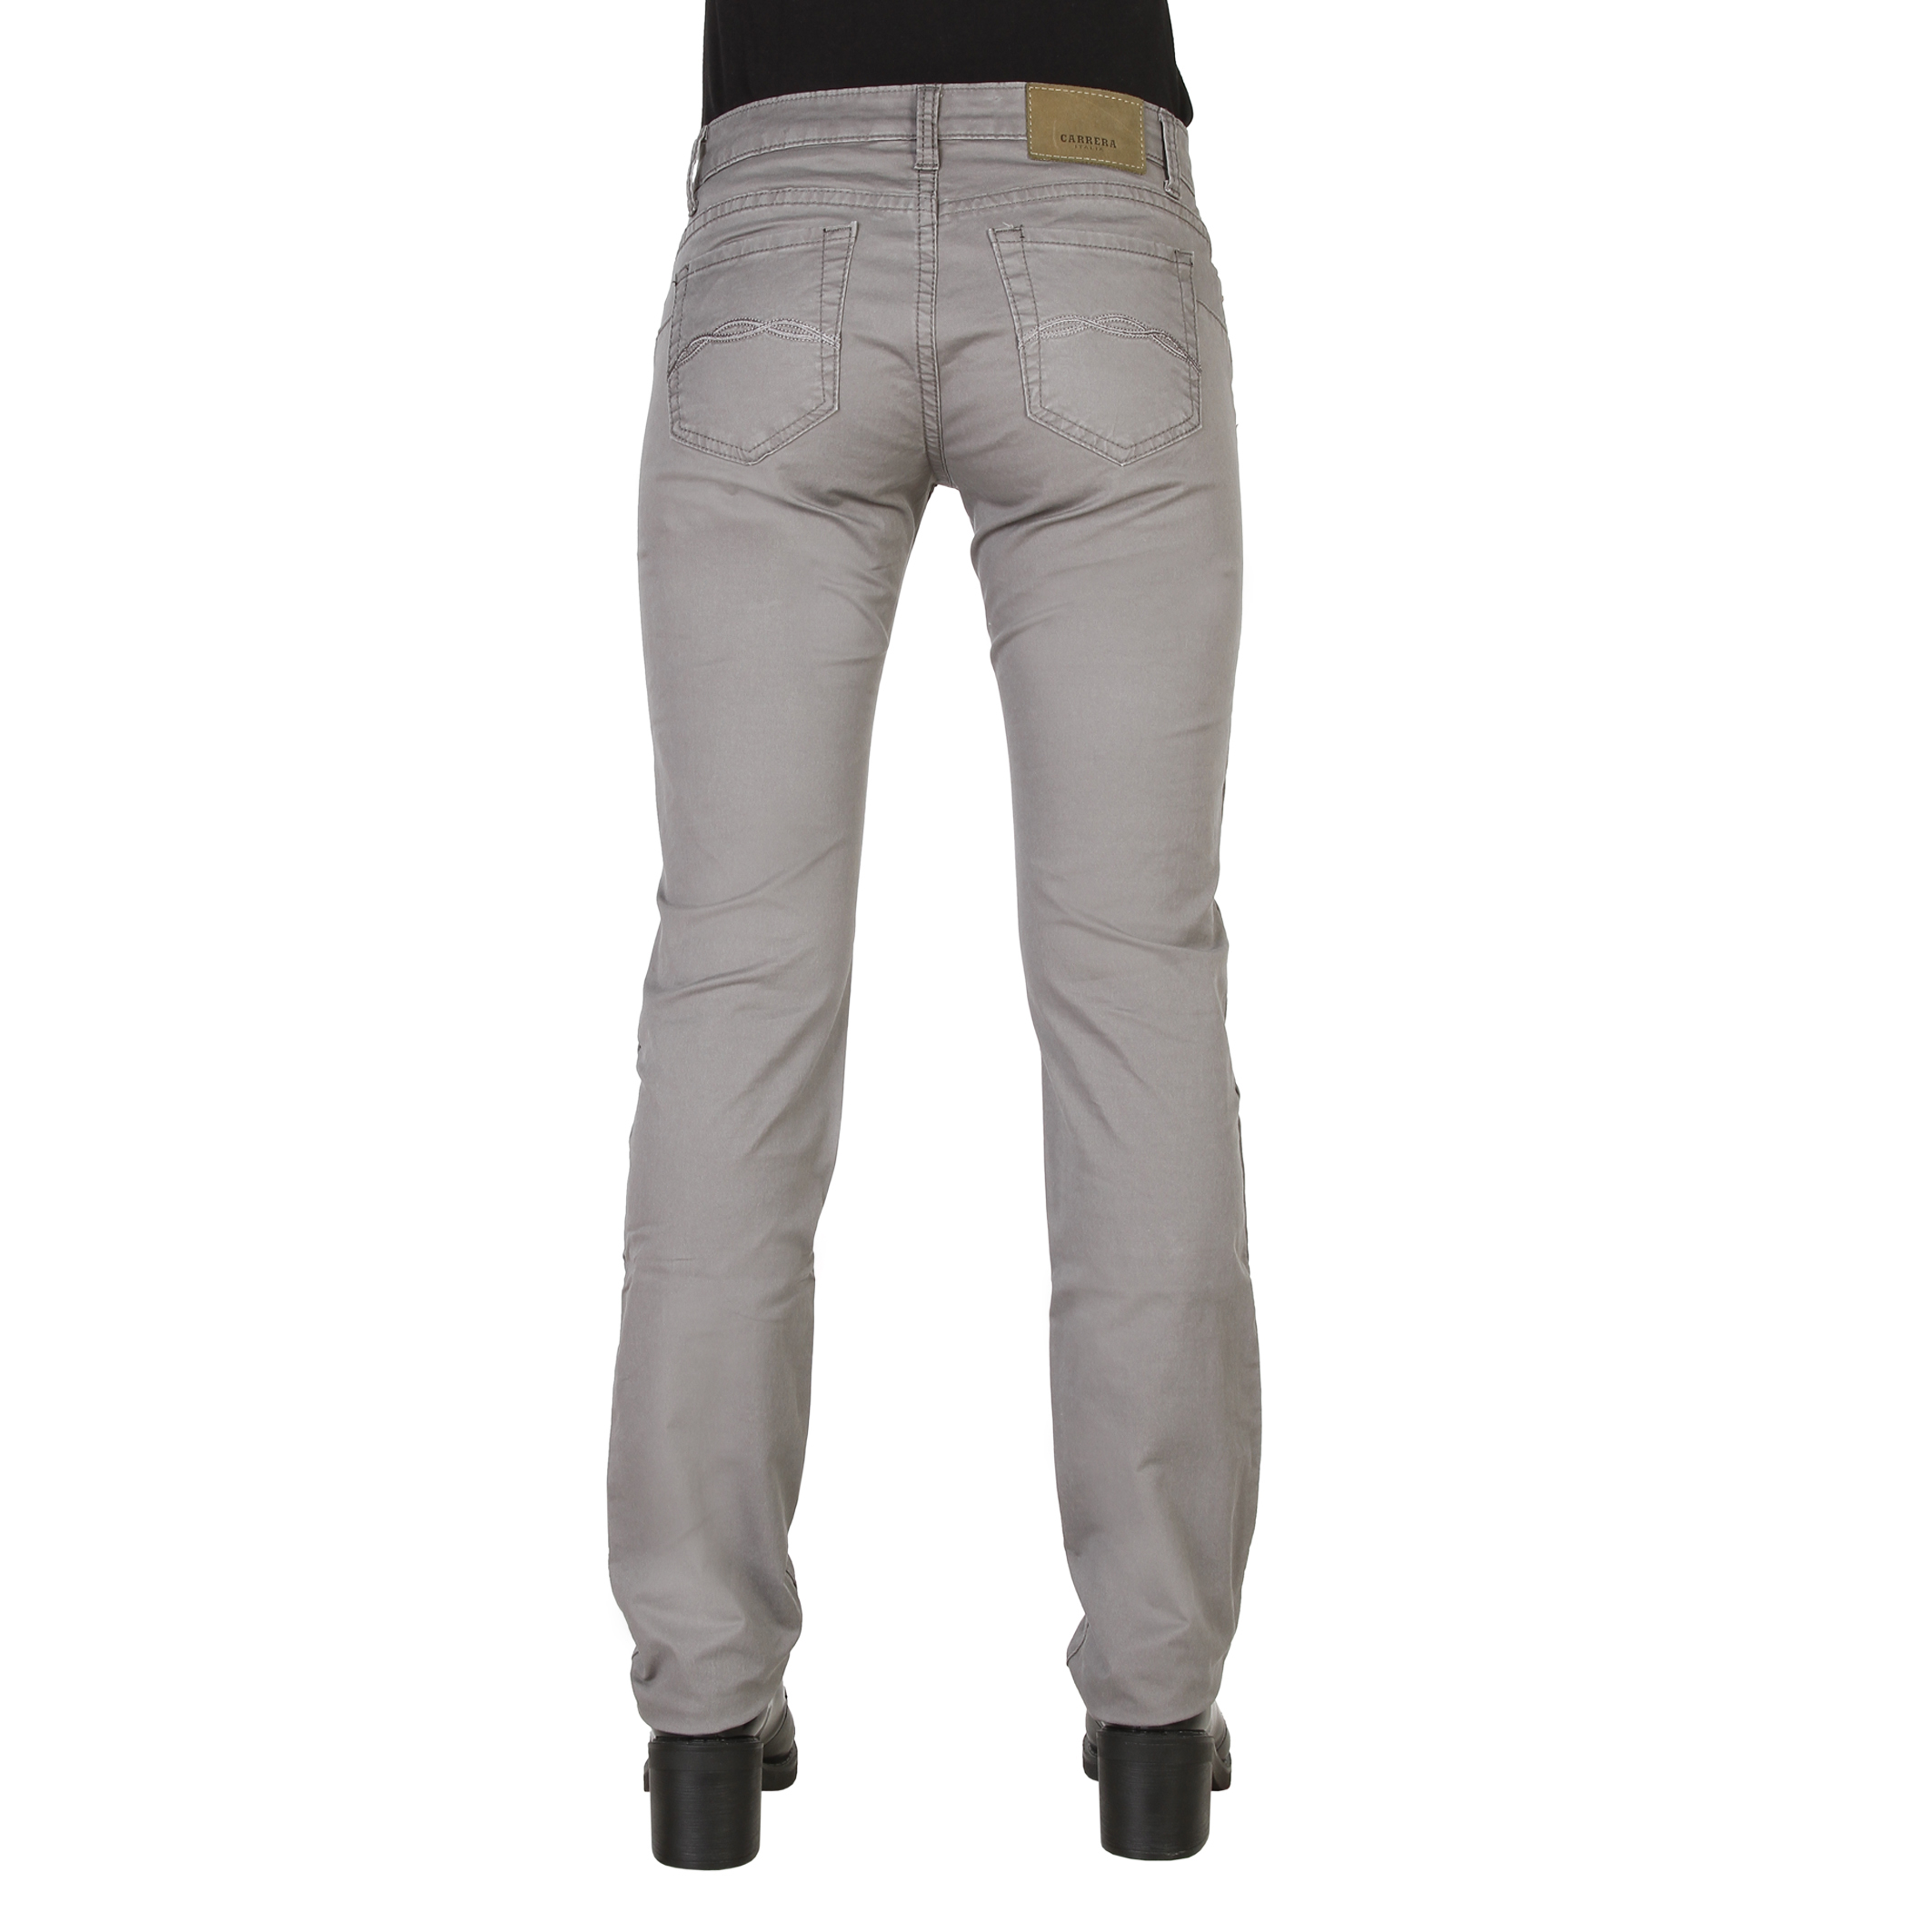 Pantalons  Carrera Jeans 000760_1556A grey